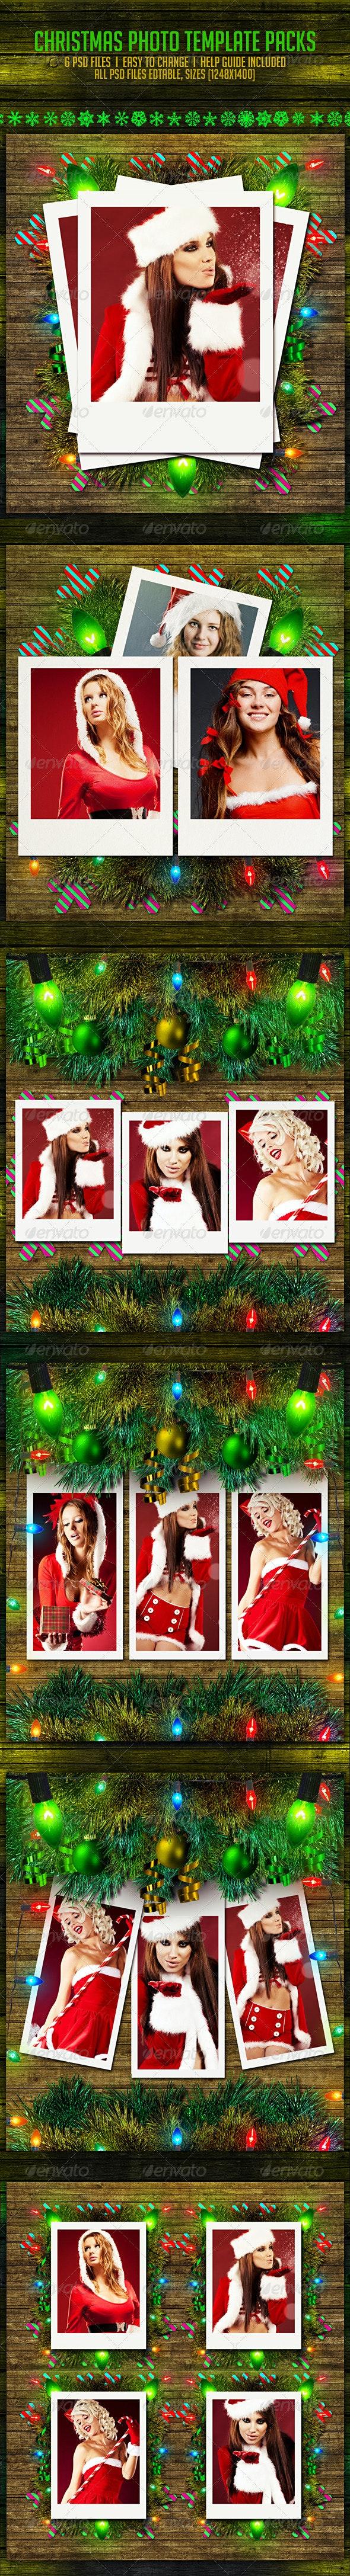 Christmas Photo Templates Pack - Seasonal Photo Templates